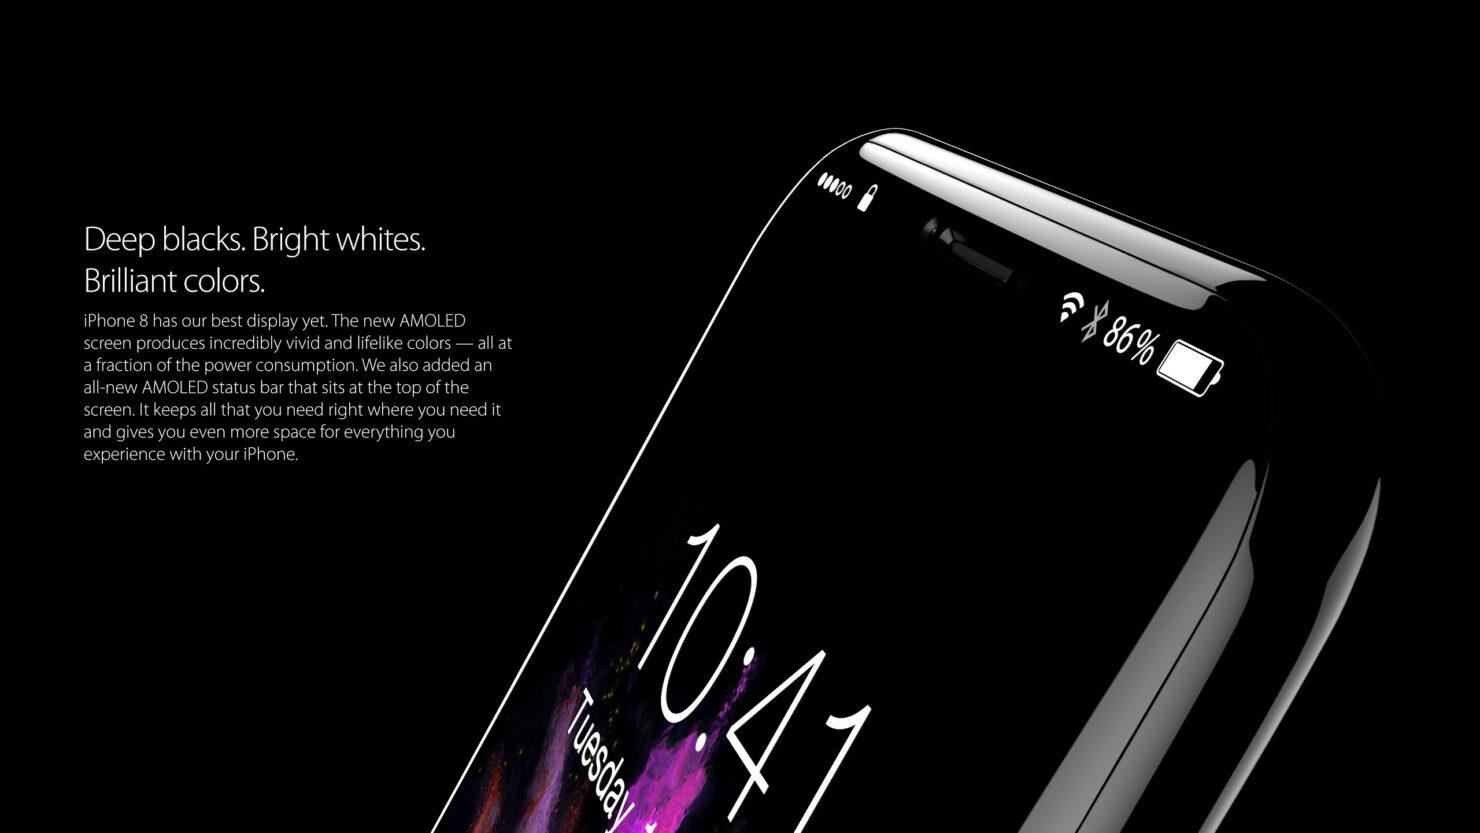 iphone-8-concept-amoled-display